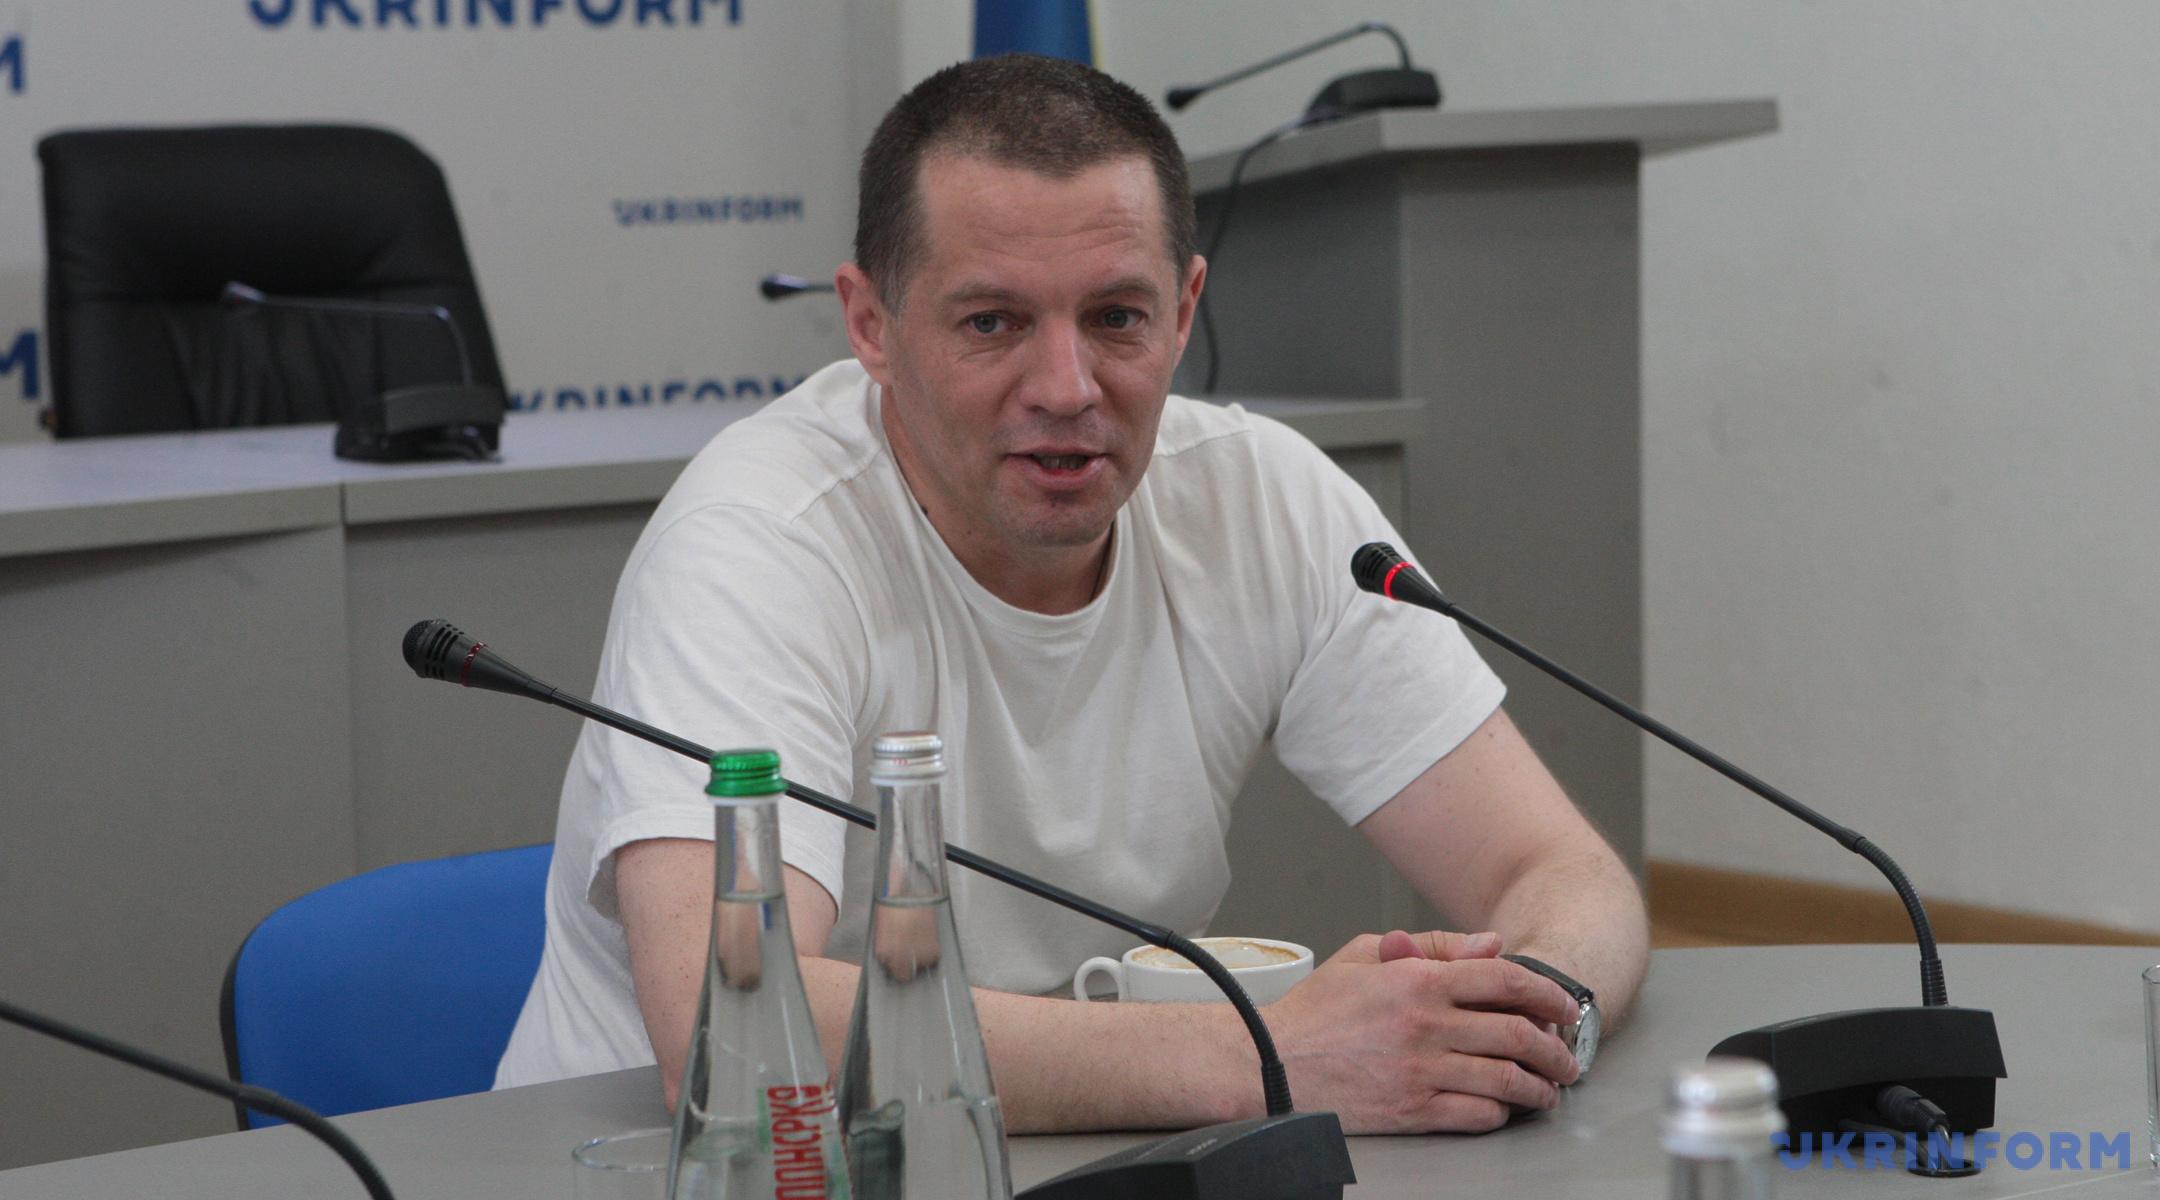 https://static.ukrinform.com/photos/2019_09/1568182896-871.jpg?0.8554424106900194